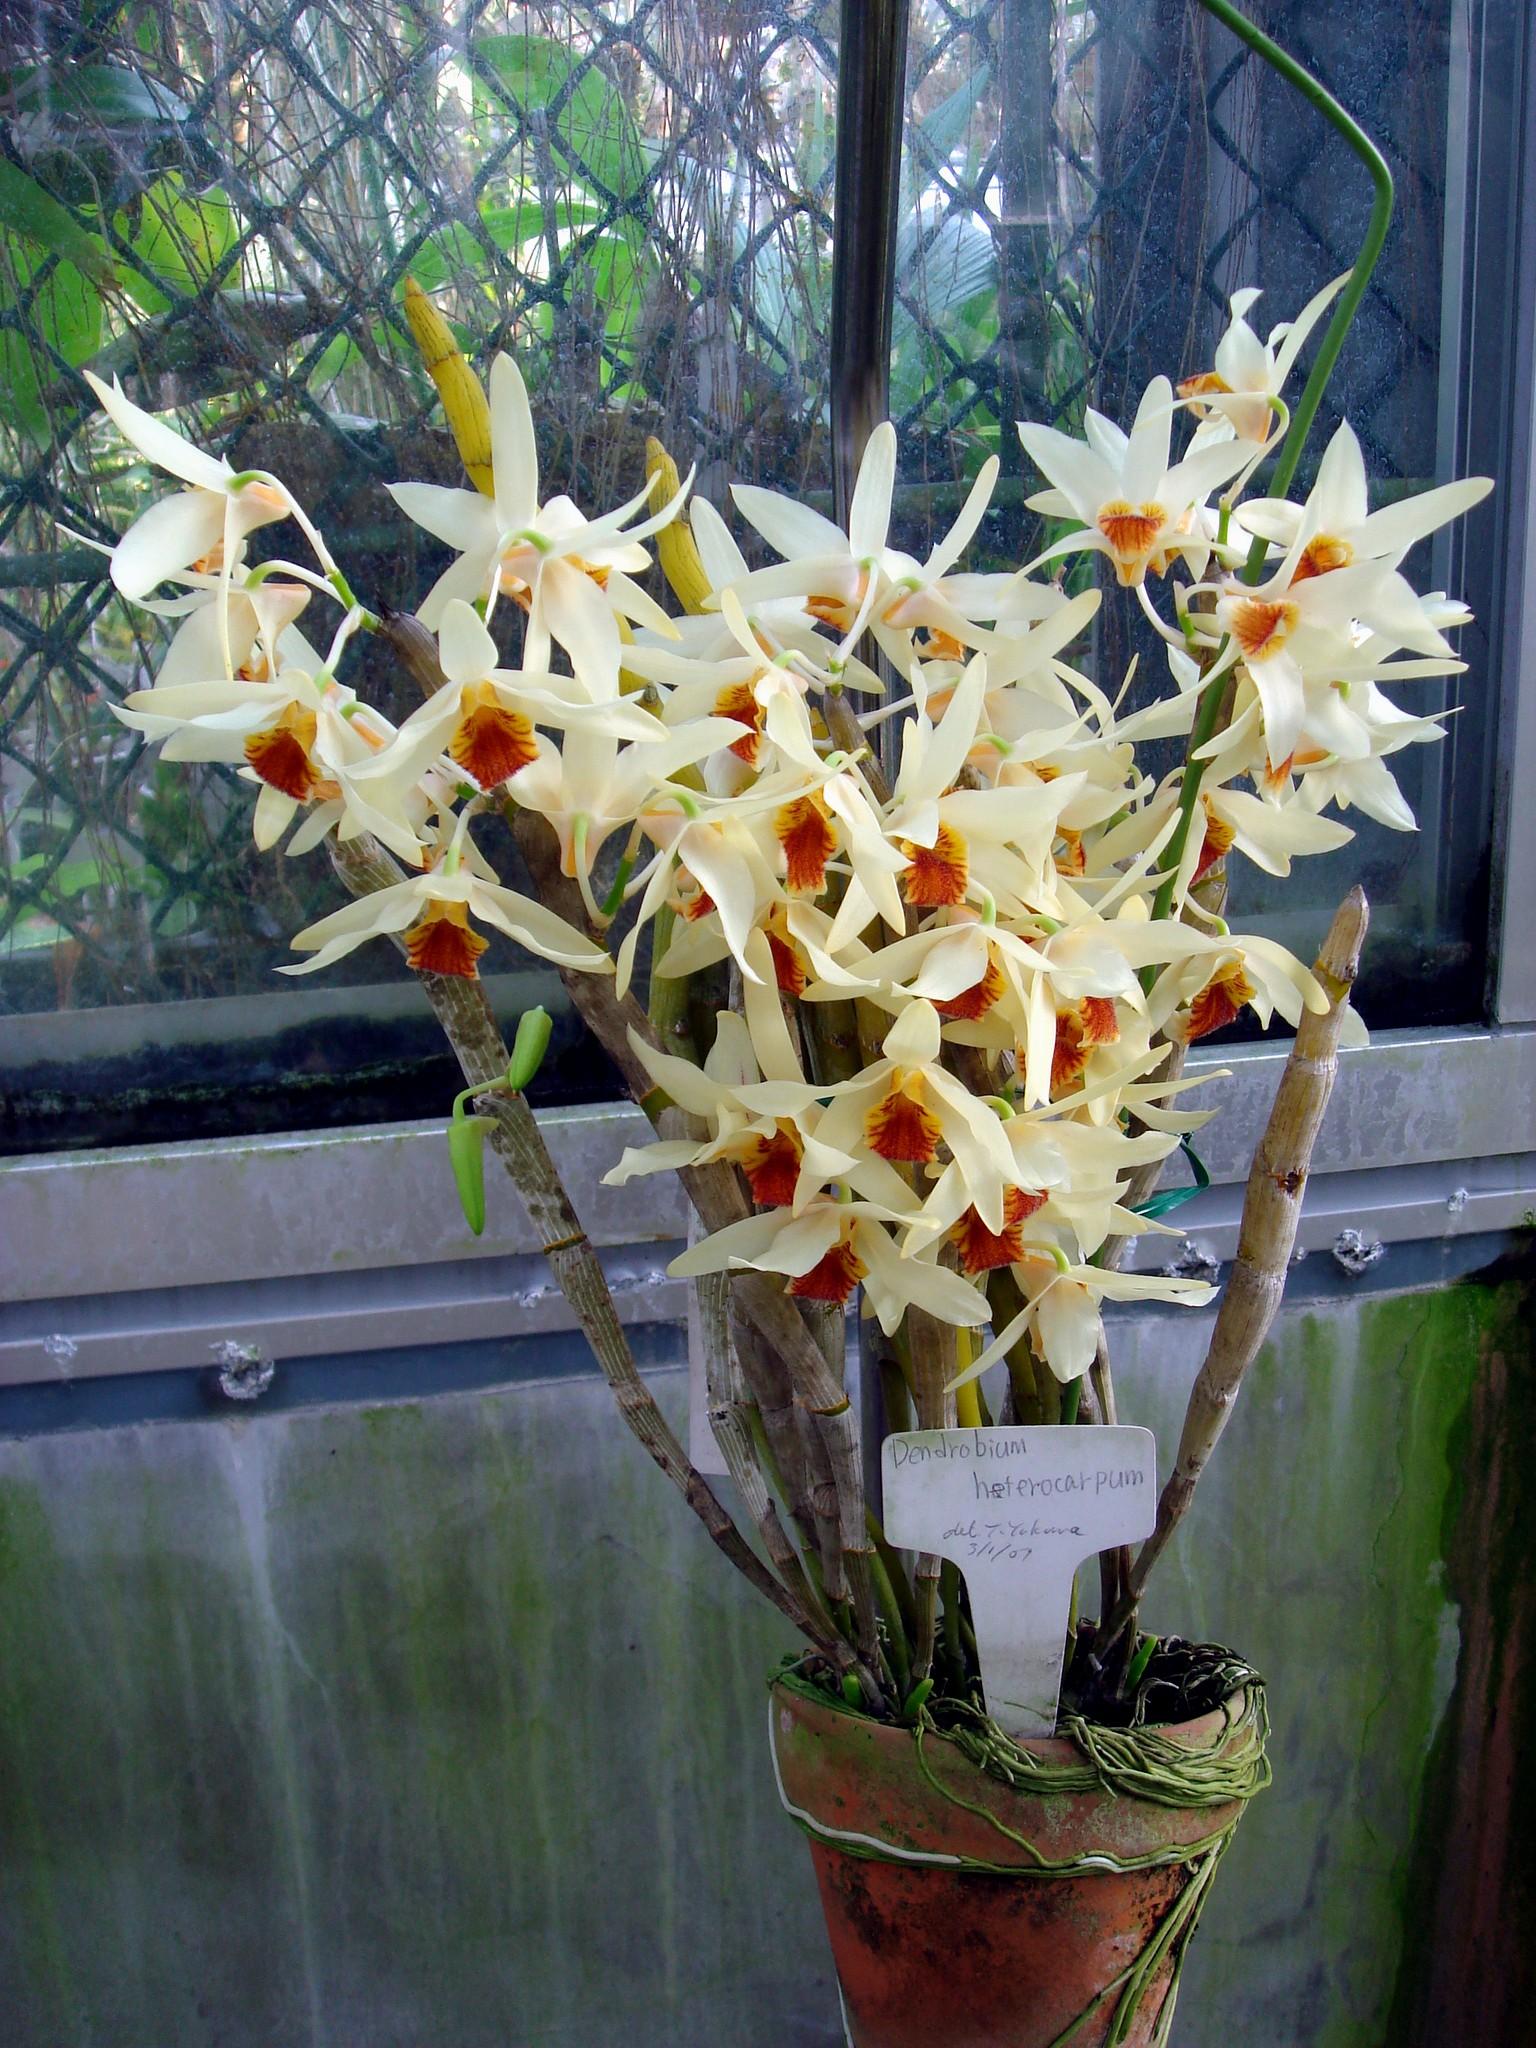 http://orchids.la.coocan.jp/Dendrobium/Dendrobium%20heterocarpum/DSC01369.JPG